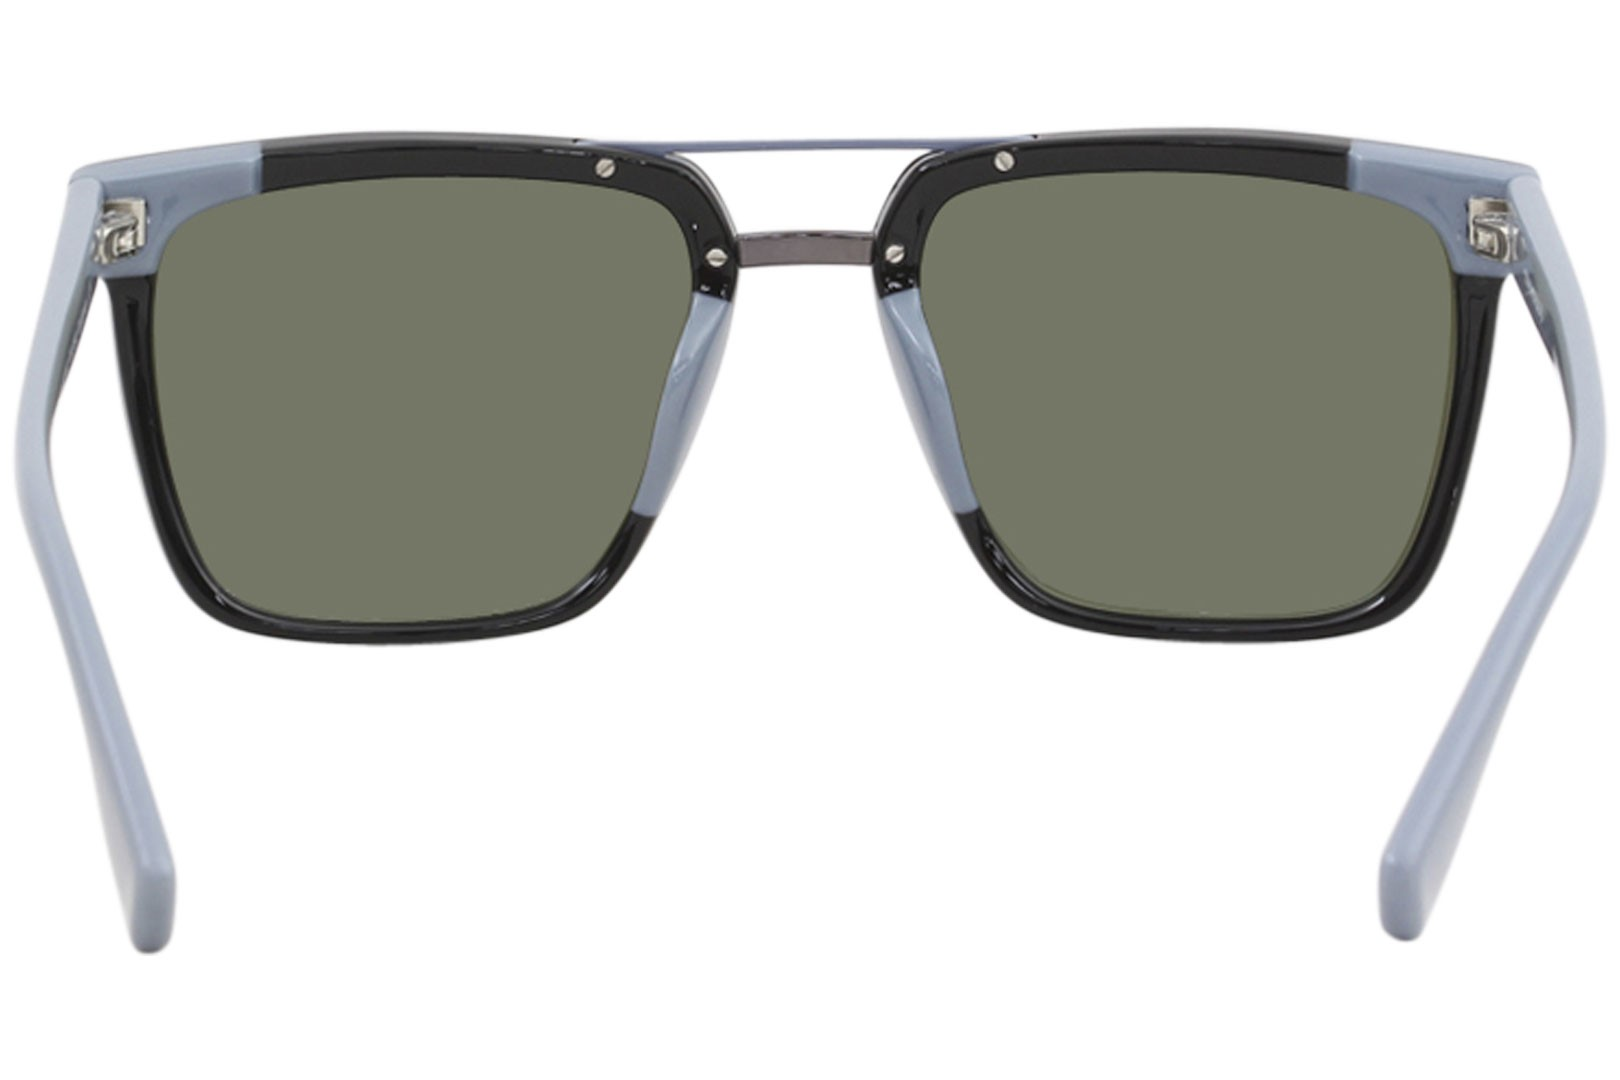 66a80d79b3820 Converse - Sunglasses Converse SCO 047 Black 0Z42 - Walmart.com